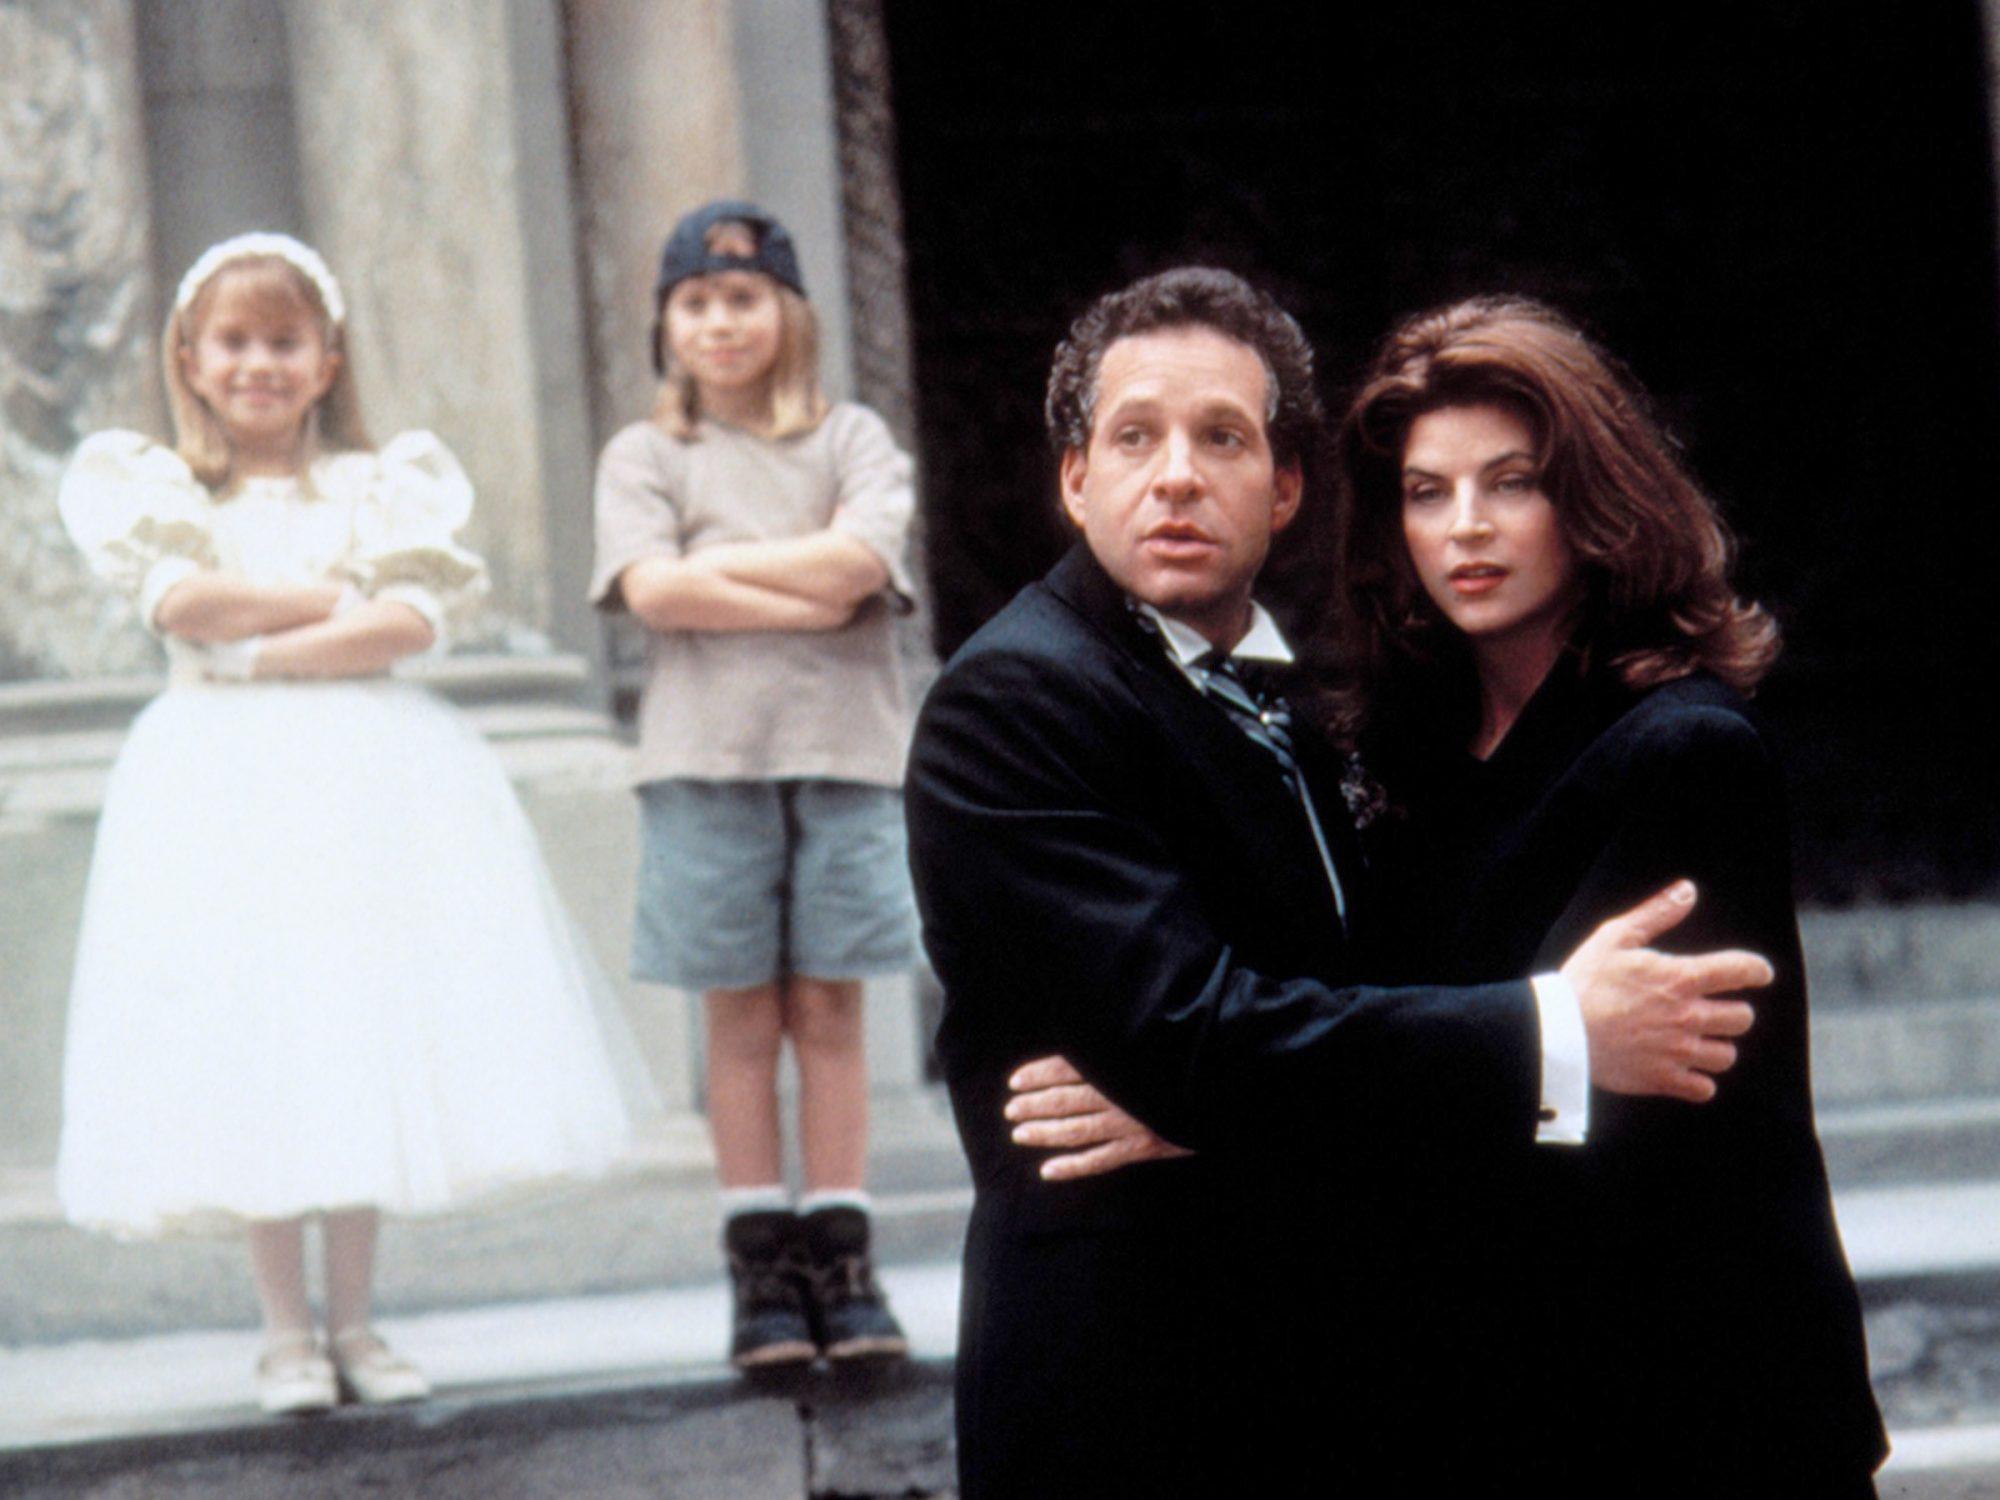 IT TAKES TWO, Ashley Olsen, Mary-Kate Olsen, Steve Guttenberg, Kirstie Alley, 1995. (c)Warner Bros./